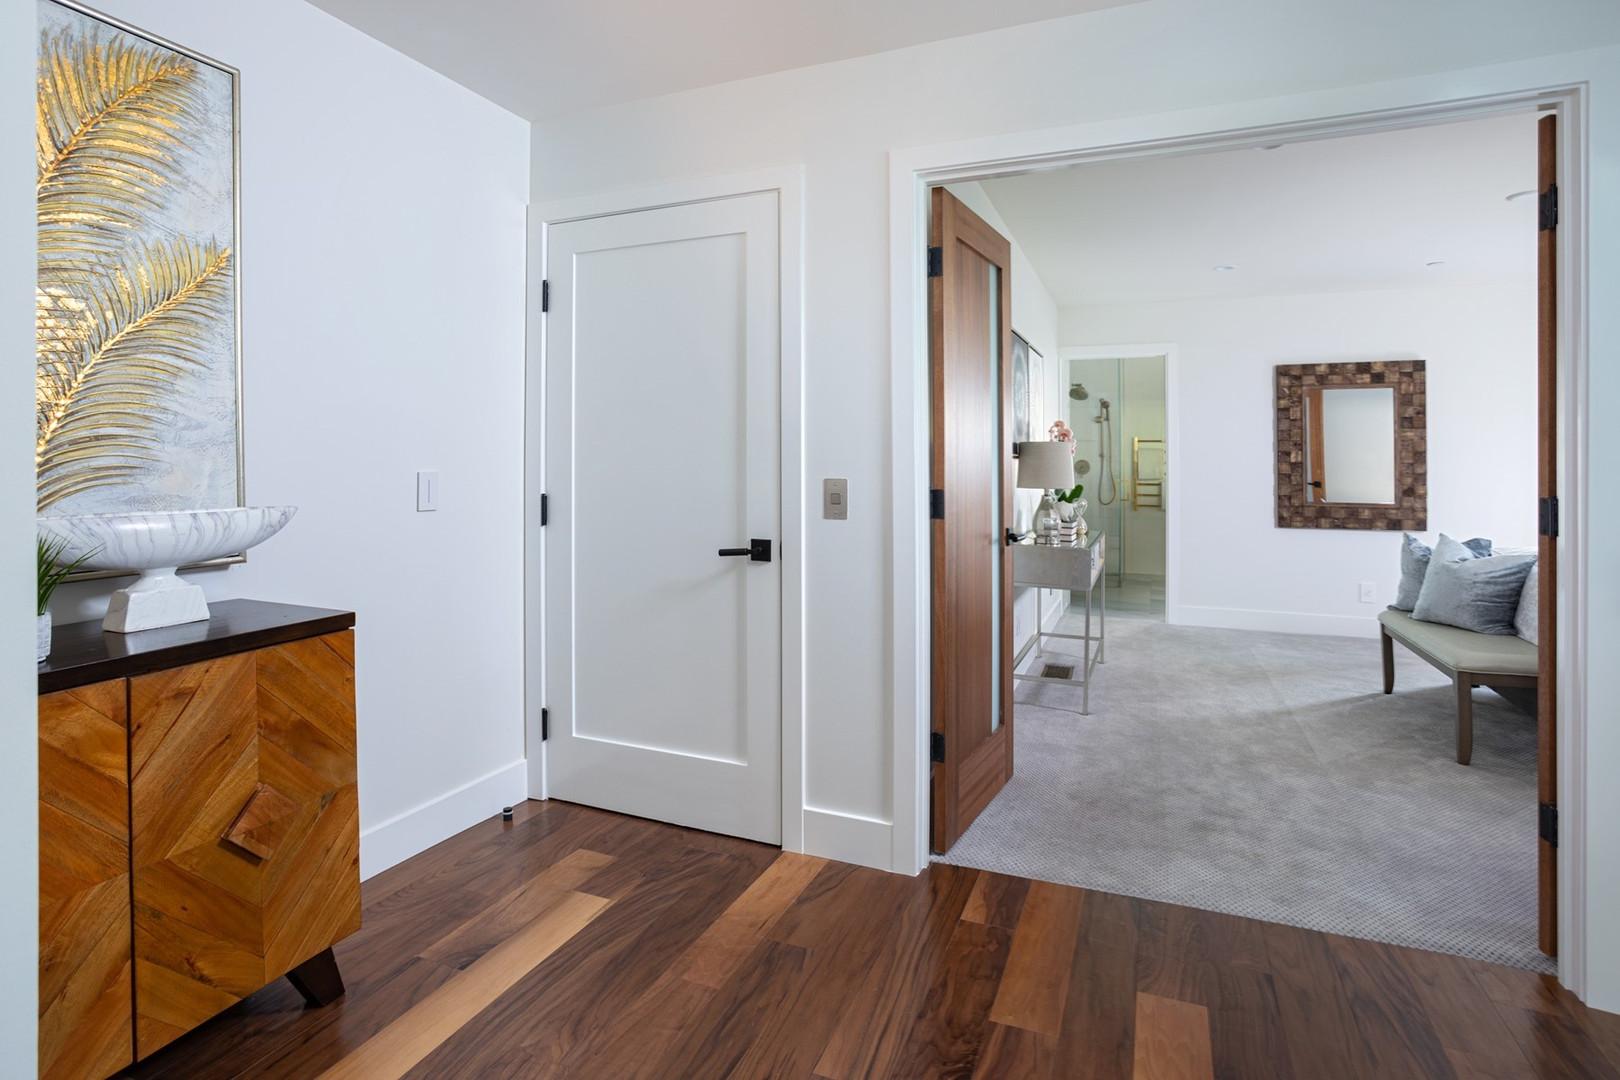 Master Entry - Note Elevator Door on Lef